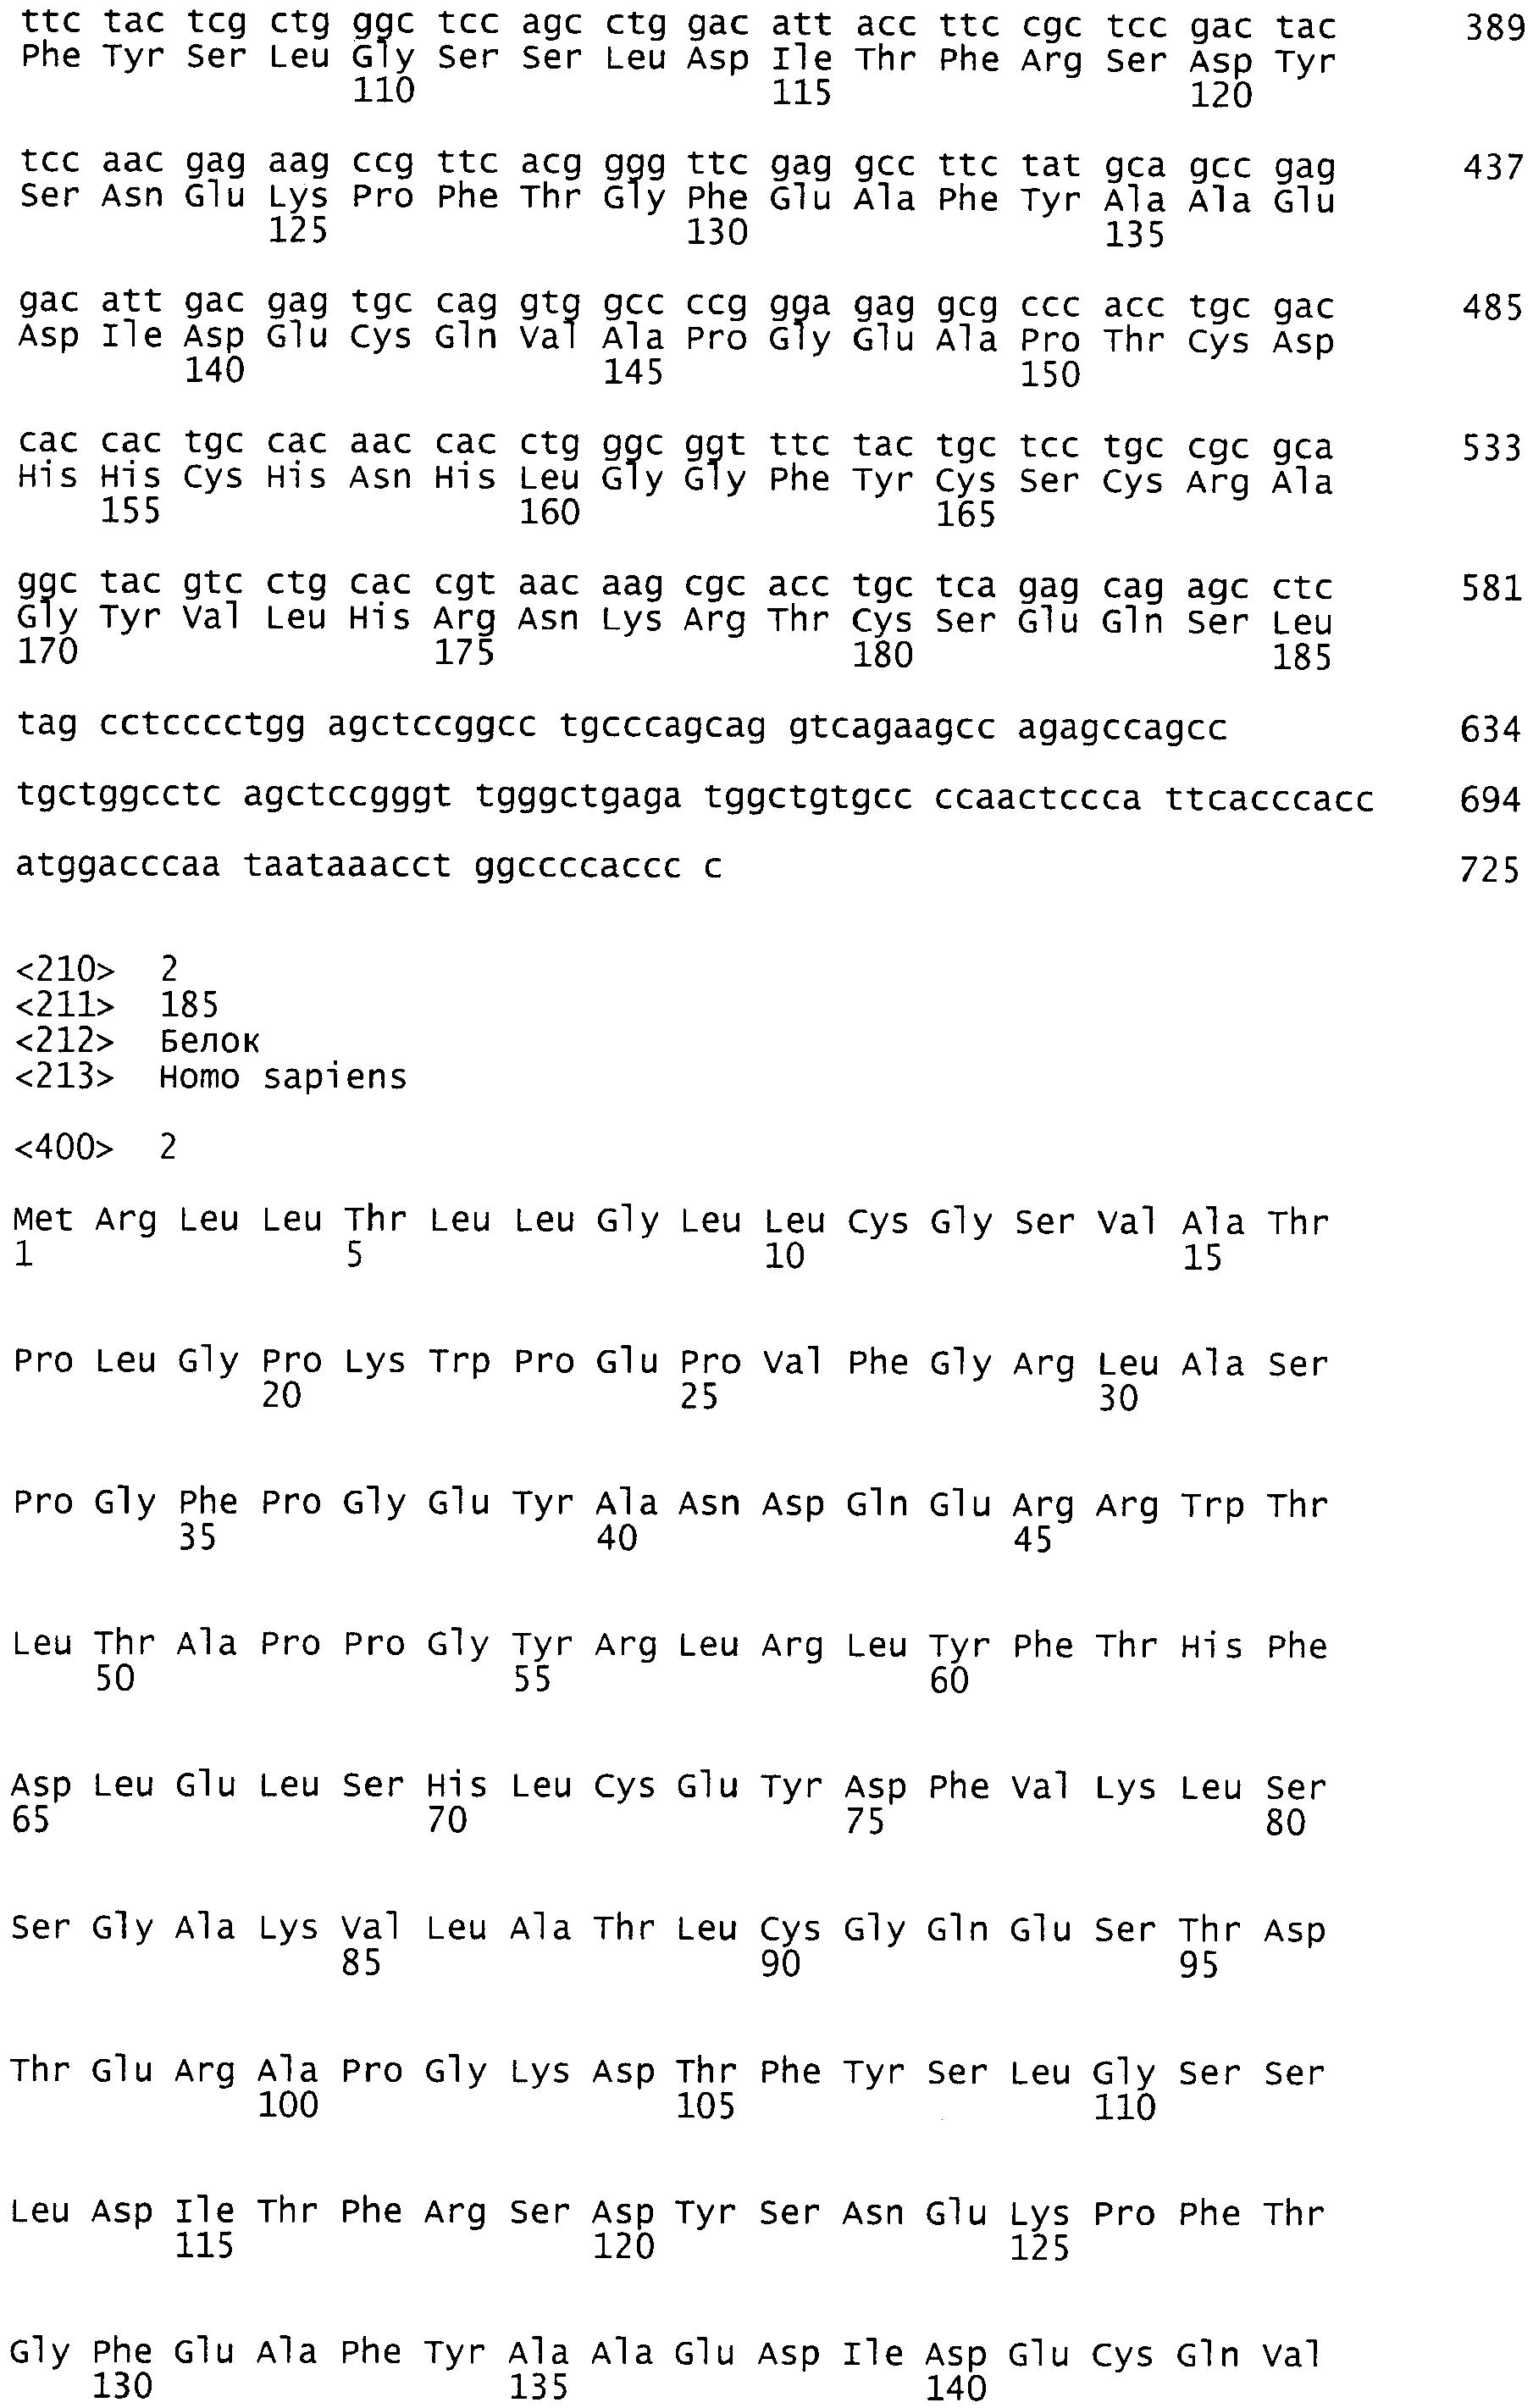 Figure 00000190